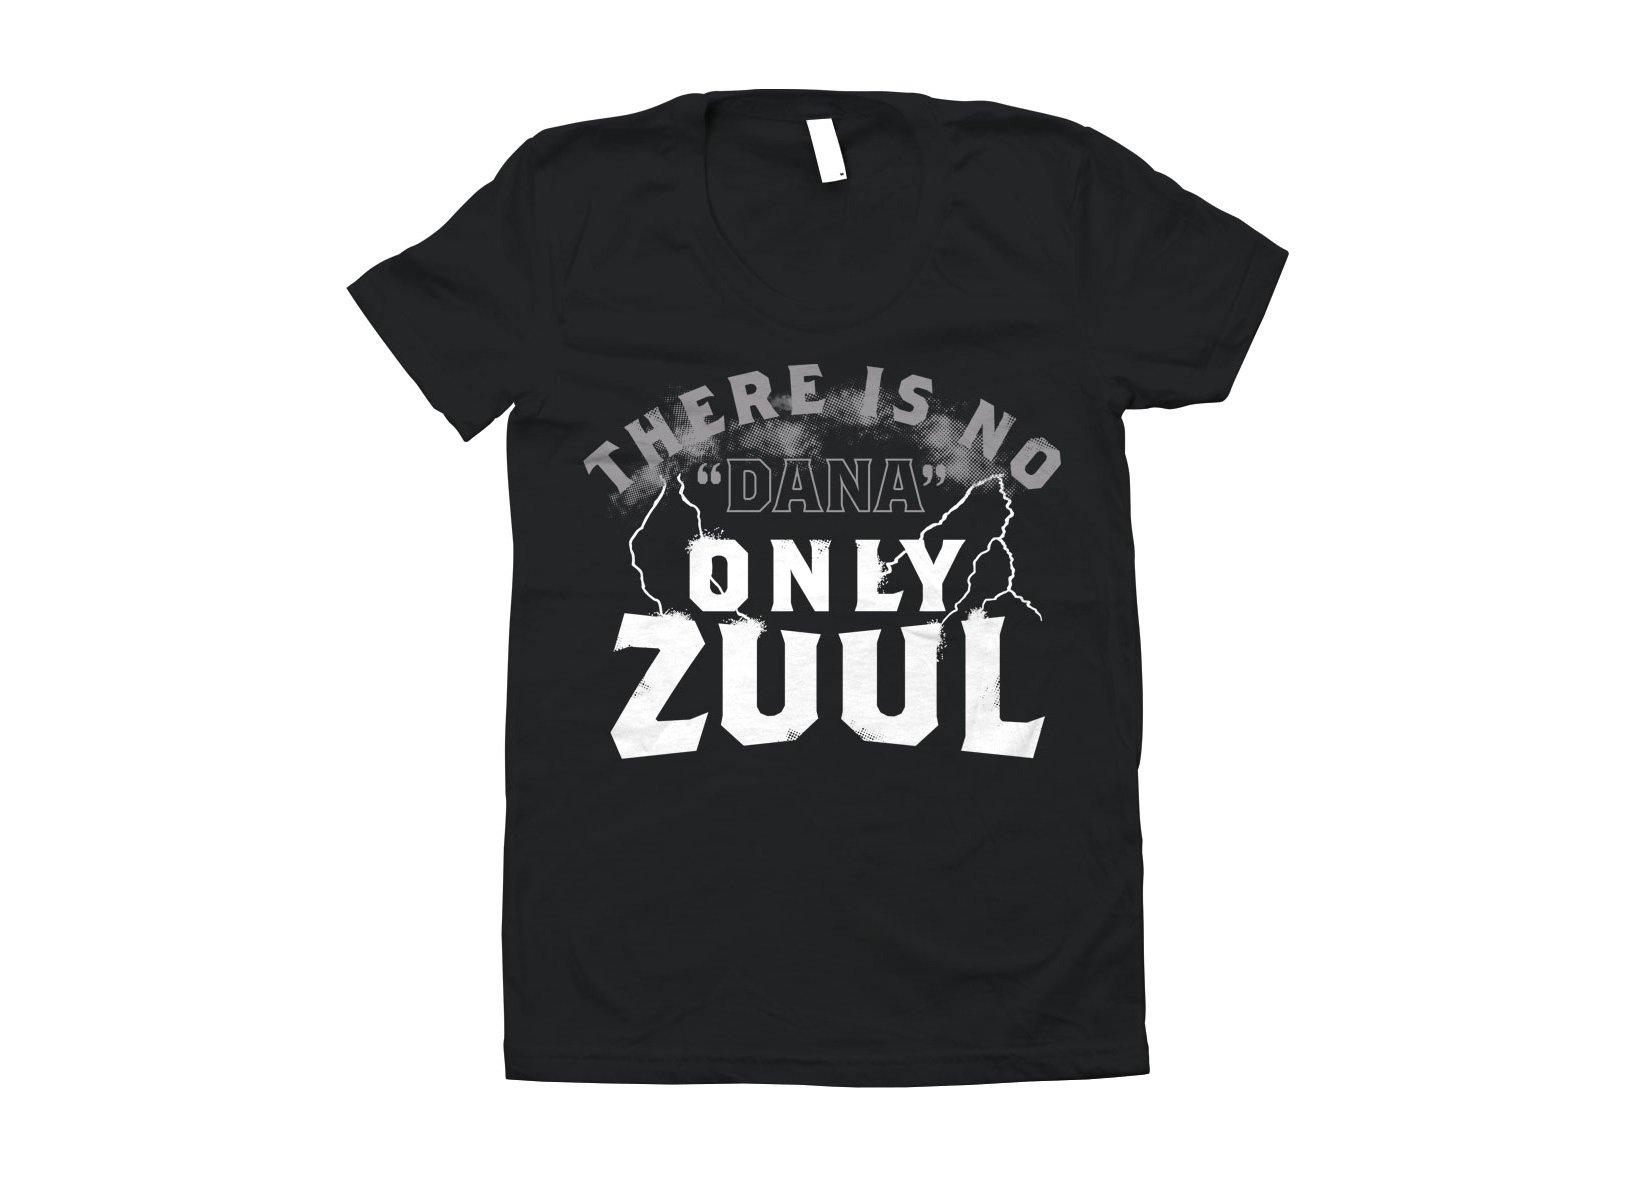 Only Zuul on Juniors T-Shirt